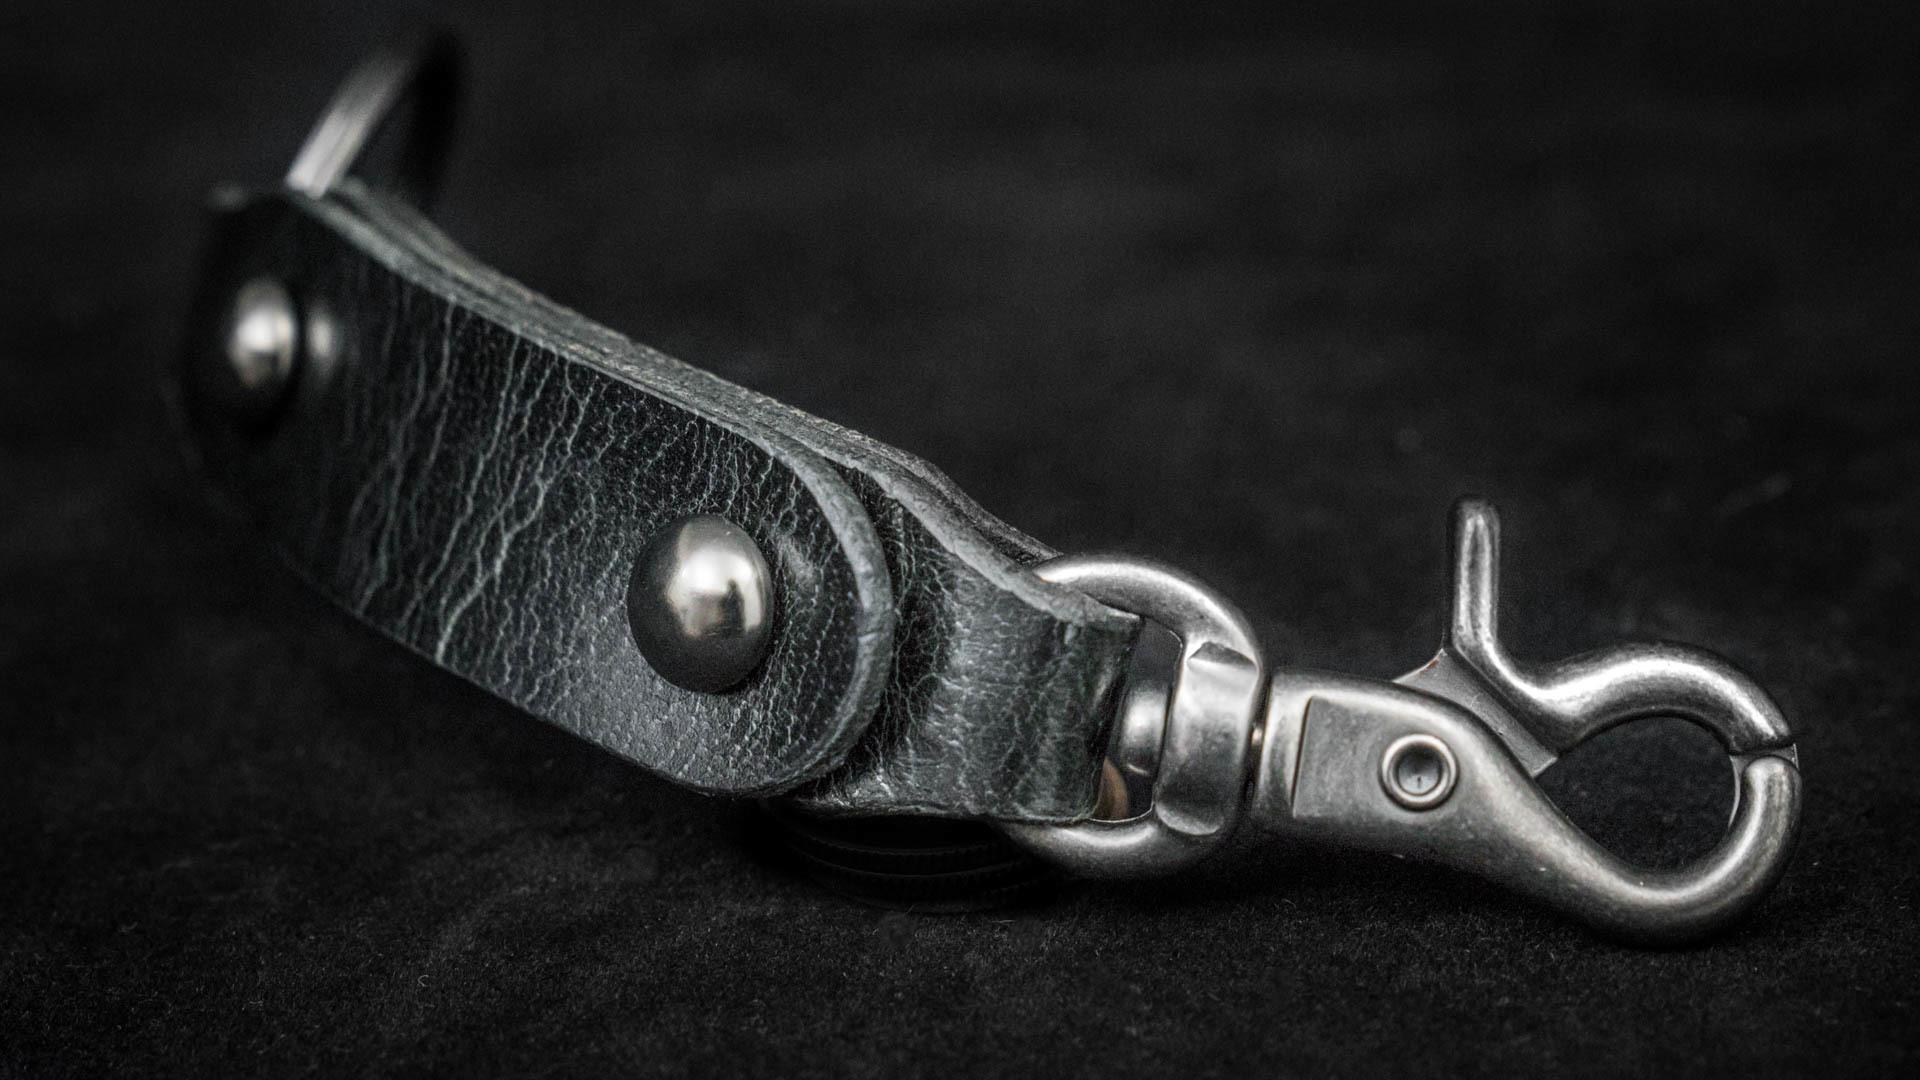 WOTANCRAFT 可拆式皮革鑰匙圈